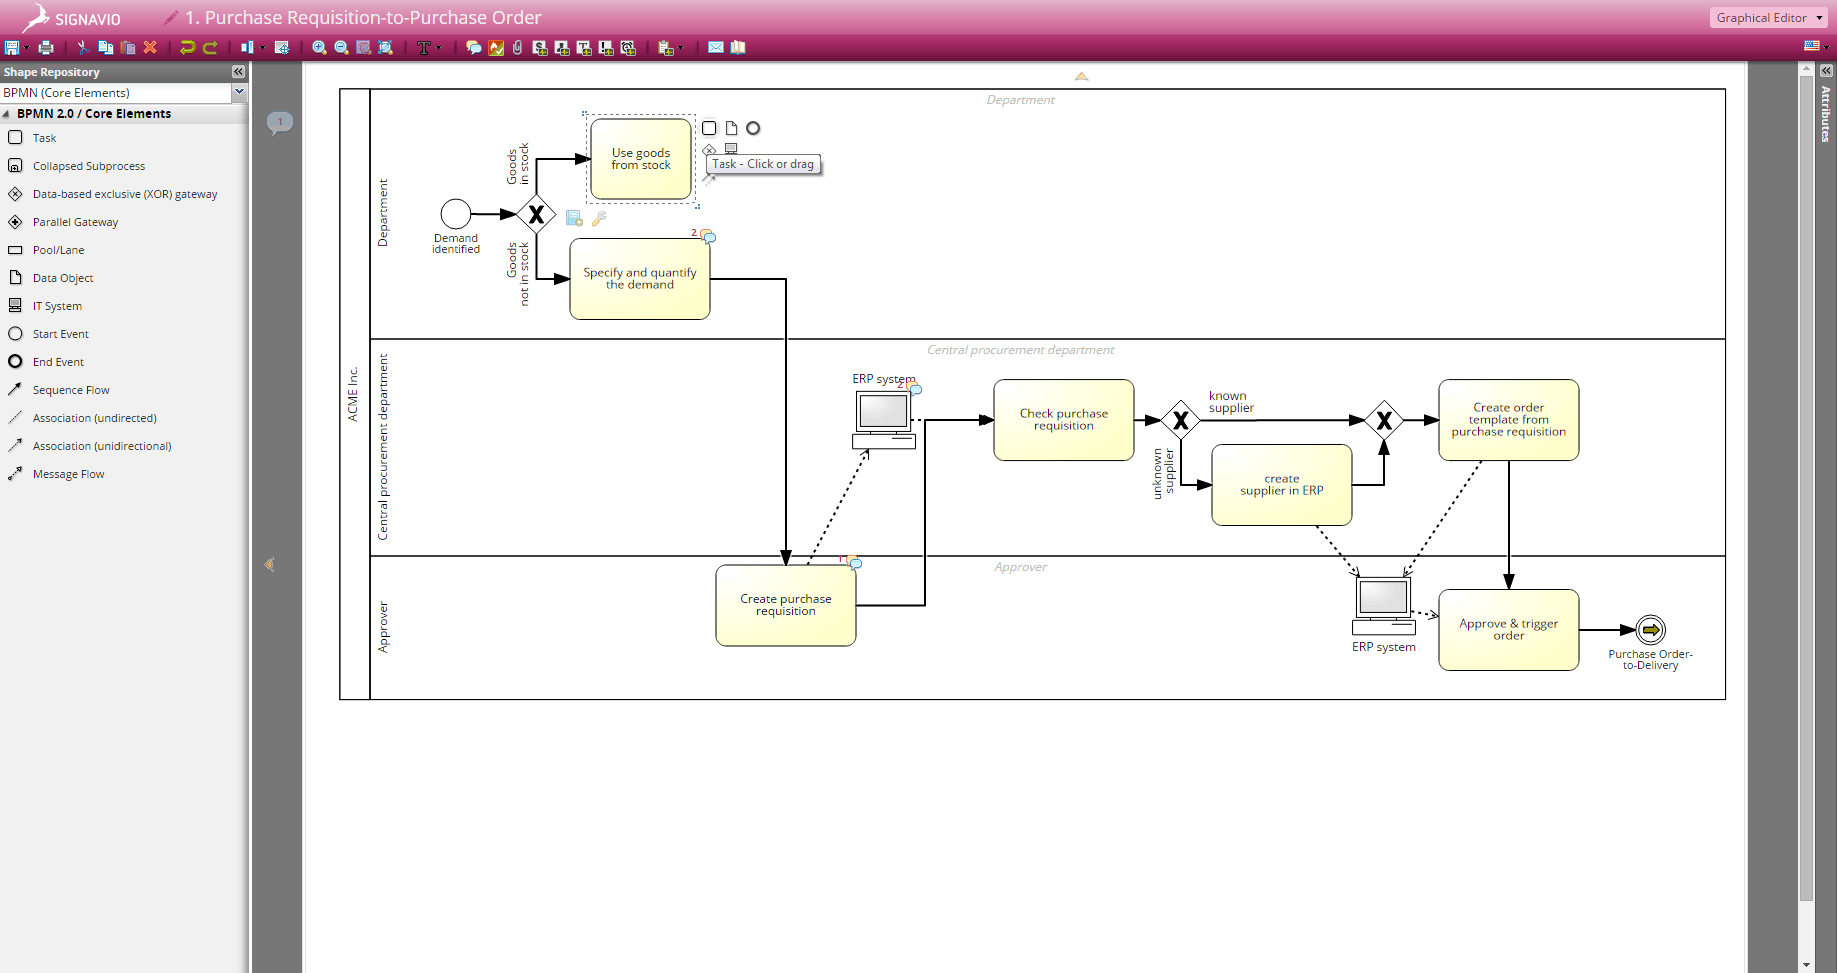 BPMN 2.0 Diagram within Signavio Process Manager